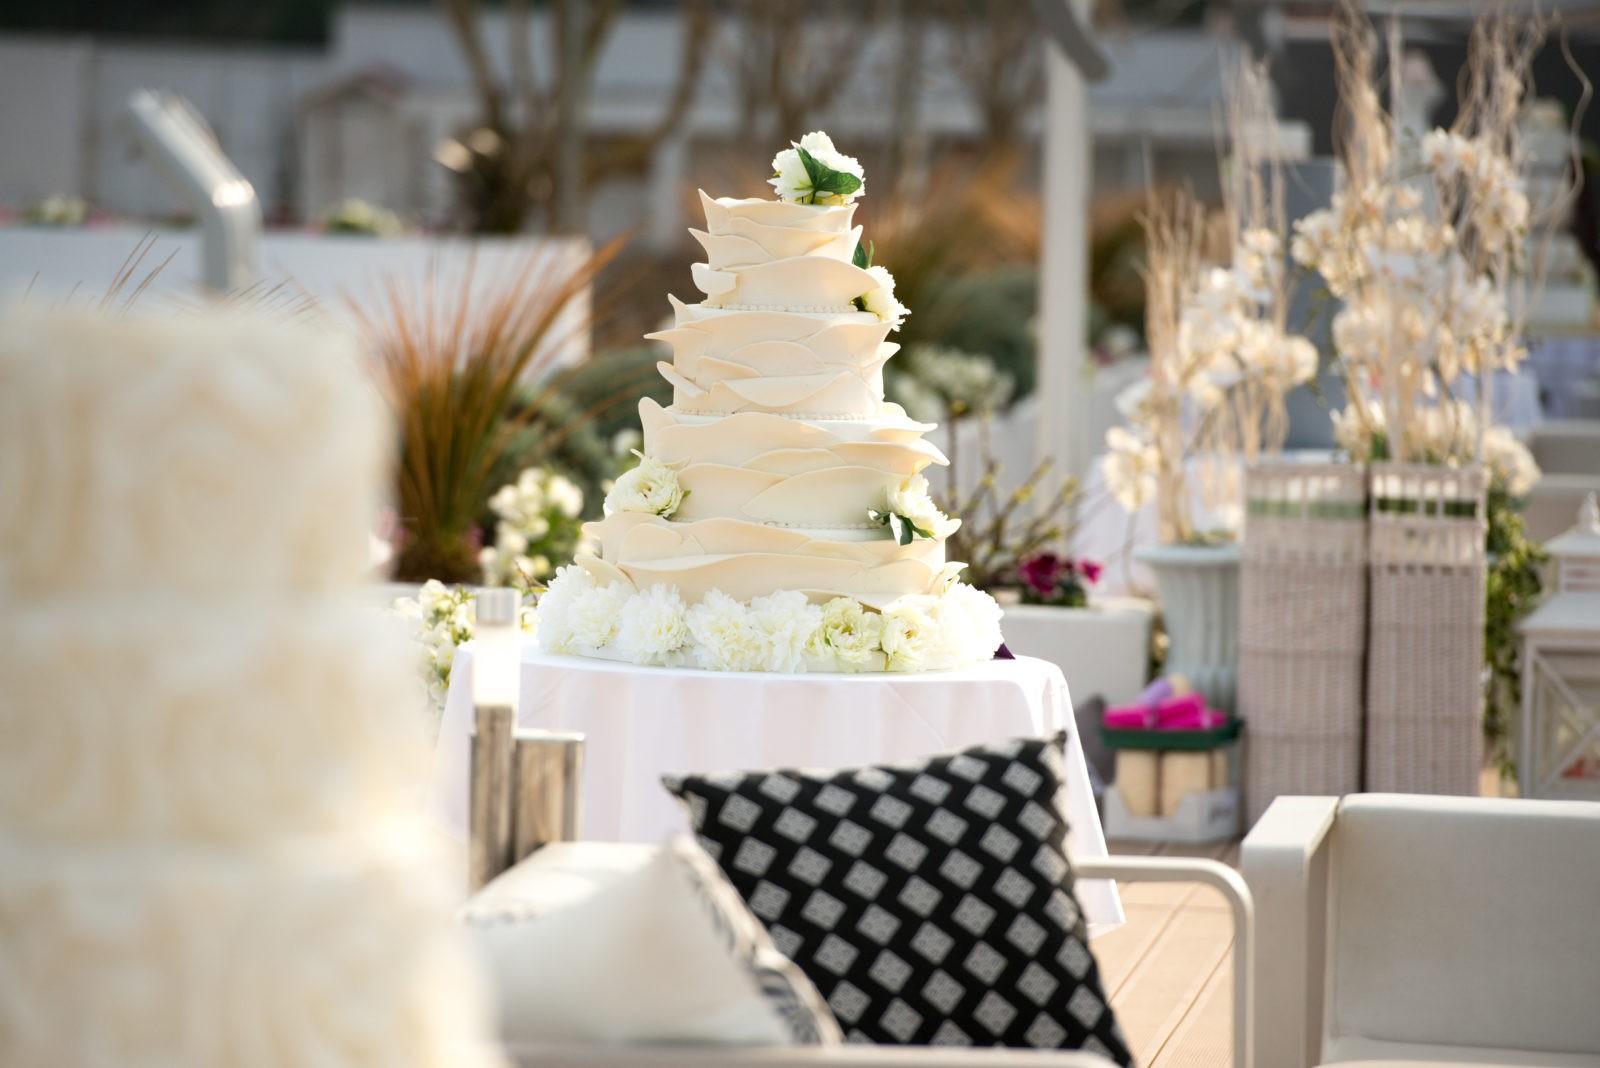 kora events, kora beacj events, kora events beach wedding, kora events location campania, kora events matrimoni campania, matrimonio campania, wedding campania, matrimonio napoli, sposi napoli